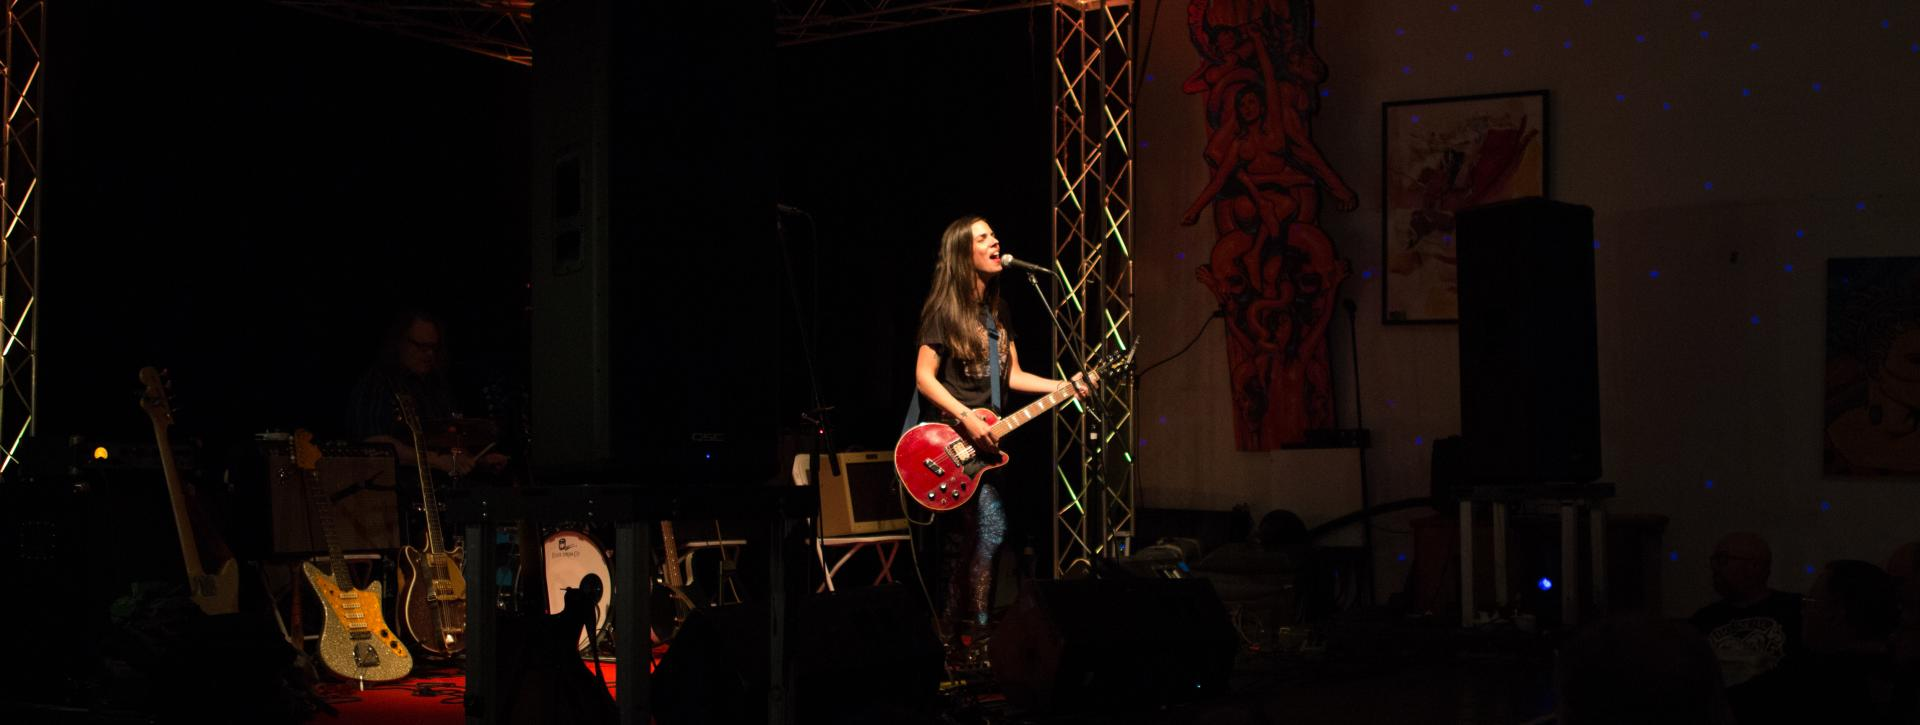 nightlife-downtown-harrisburg-pa-live-music